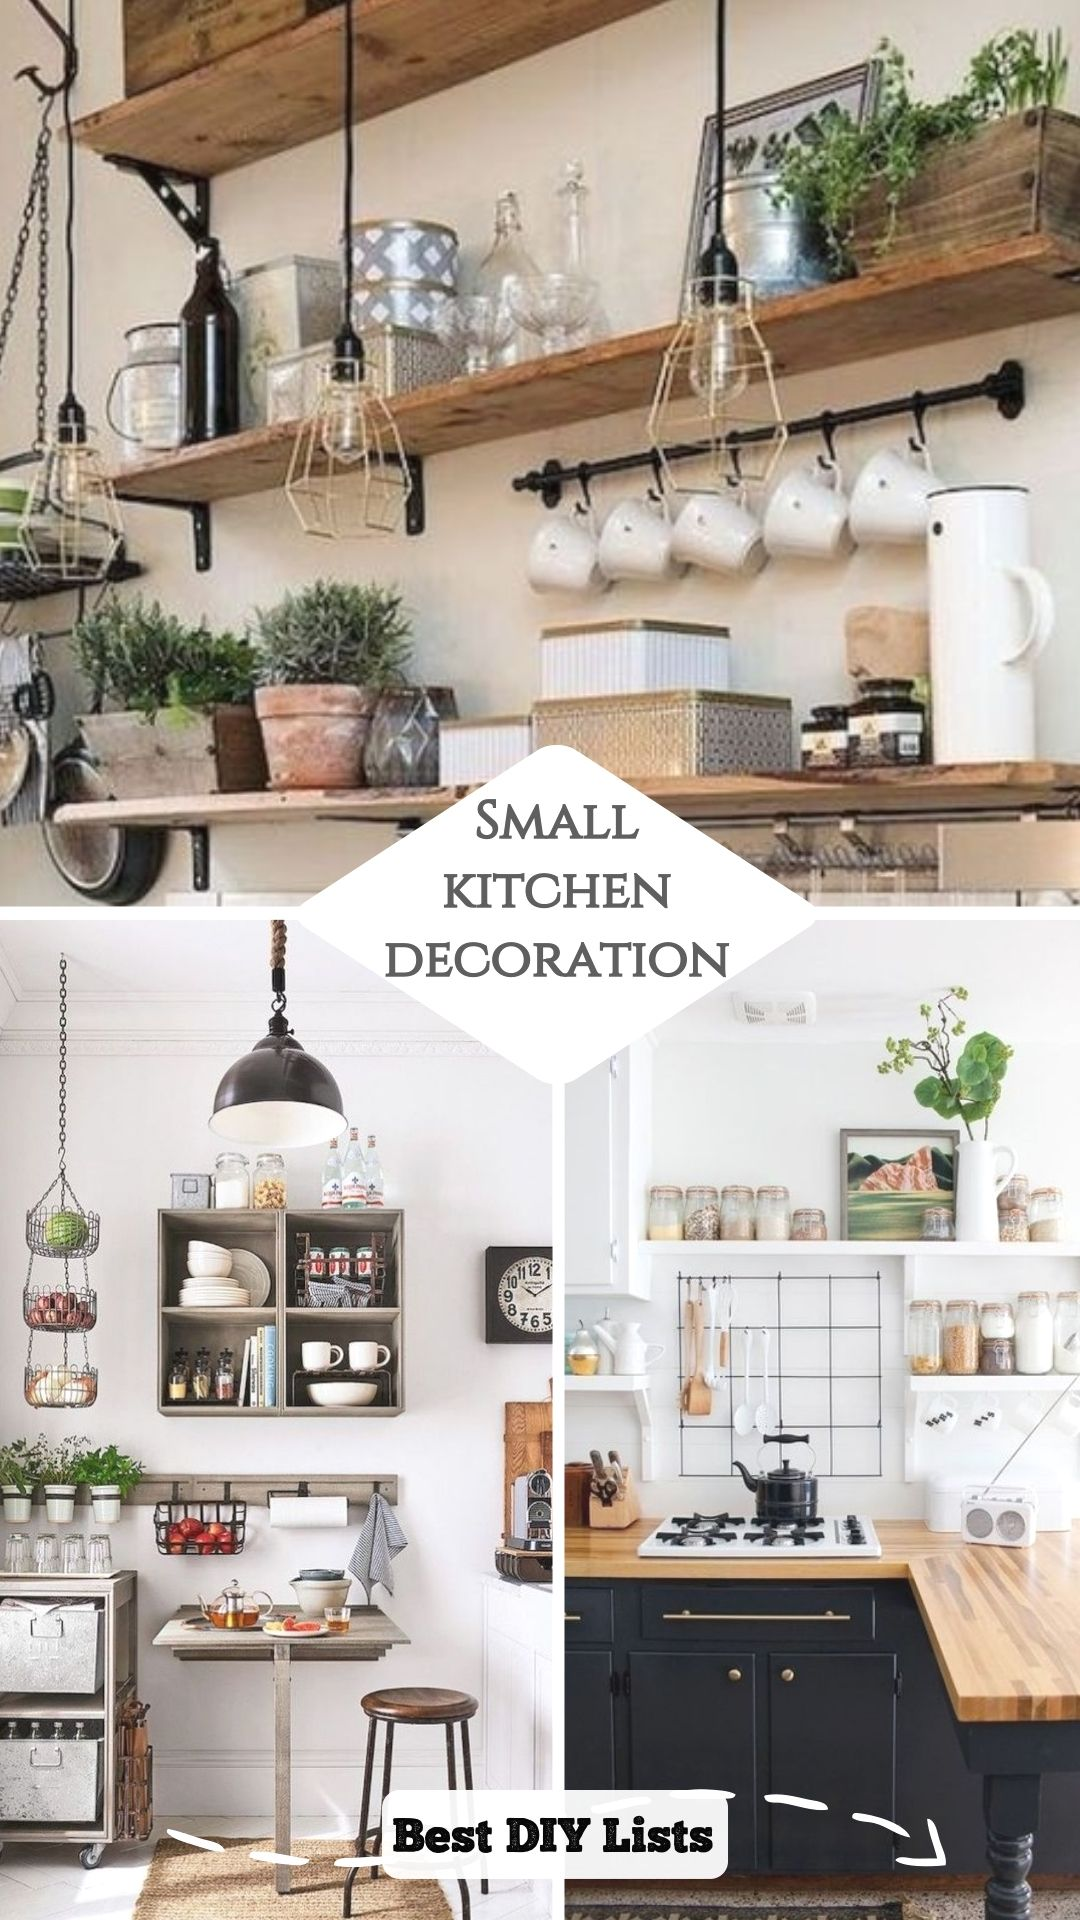 10 Unique Small Kitchen Design Ideas: 10 Clever Ideas For Small Kitchen Decoration In 2020